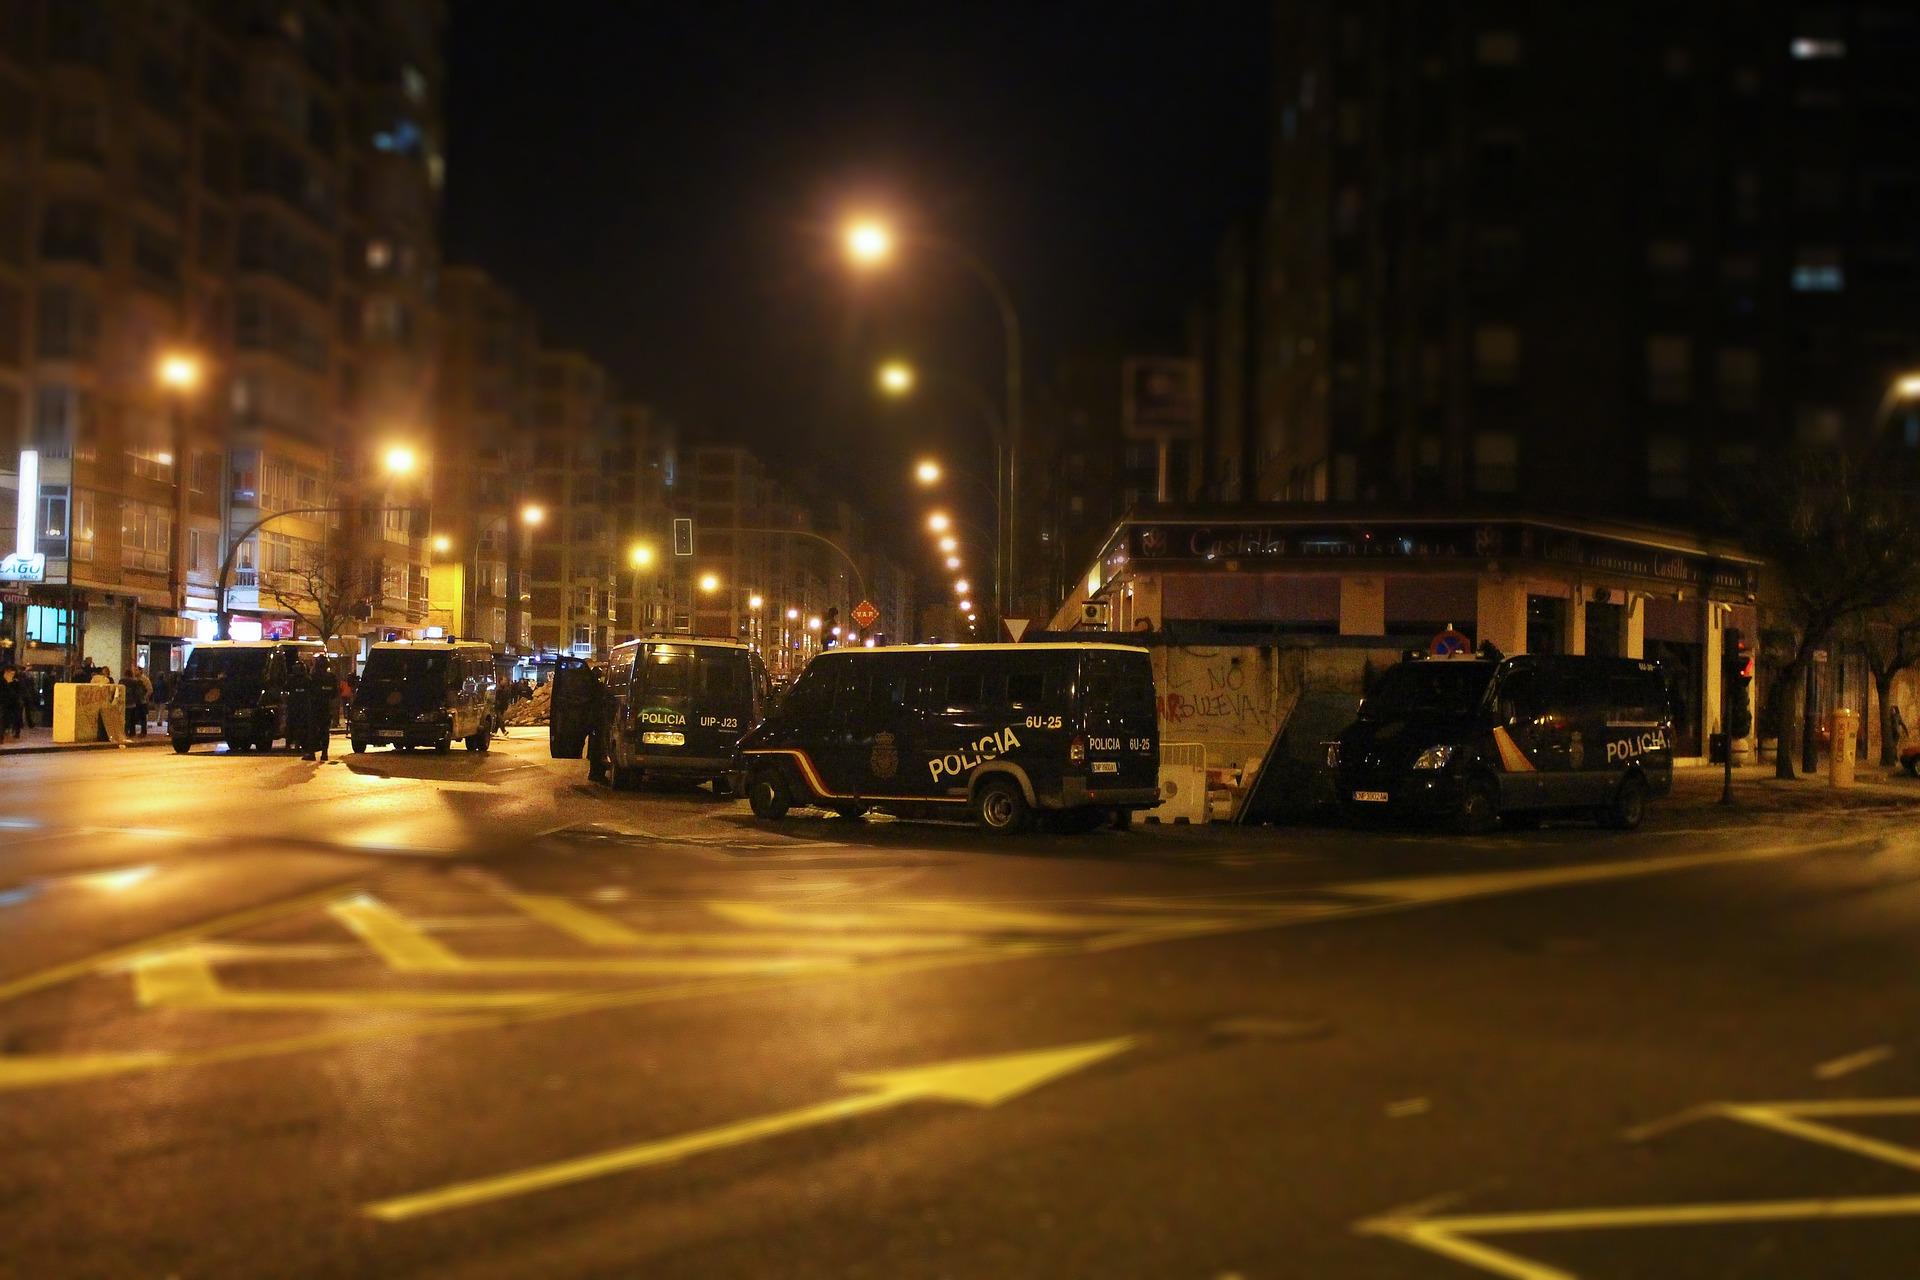 riot, street